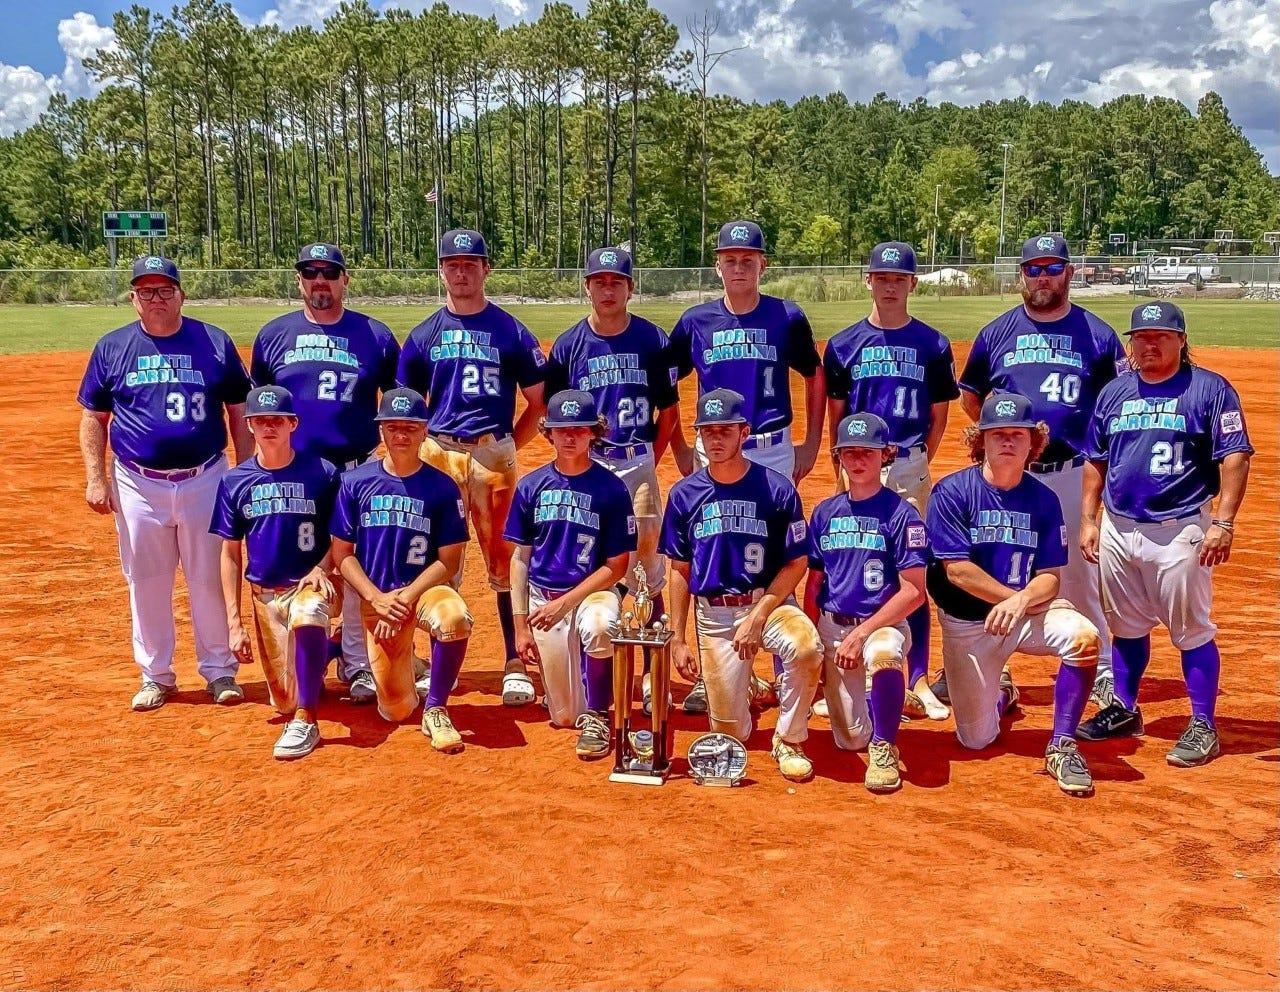 Hope Mills Fayetteville Dixie Boys Baseball Team To Play World Series Tournament In Louisiana